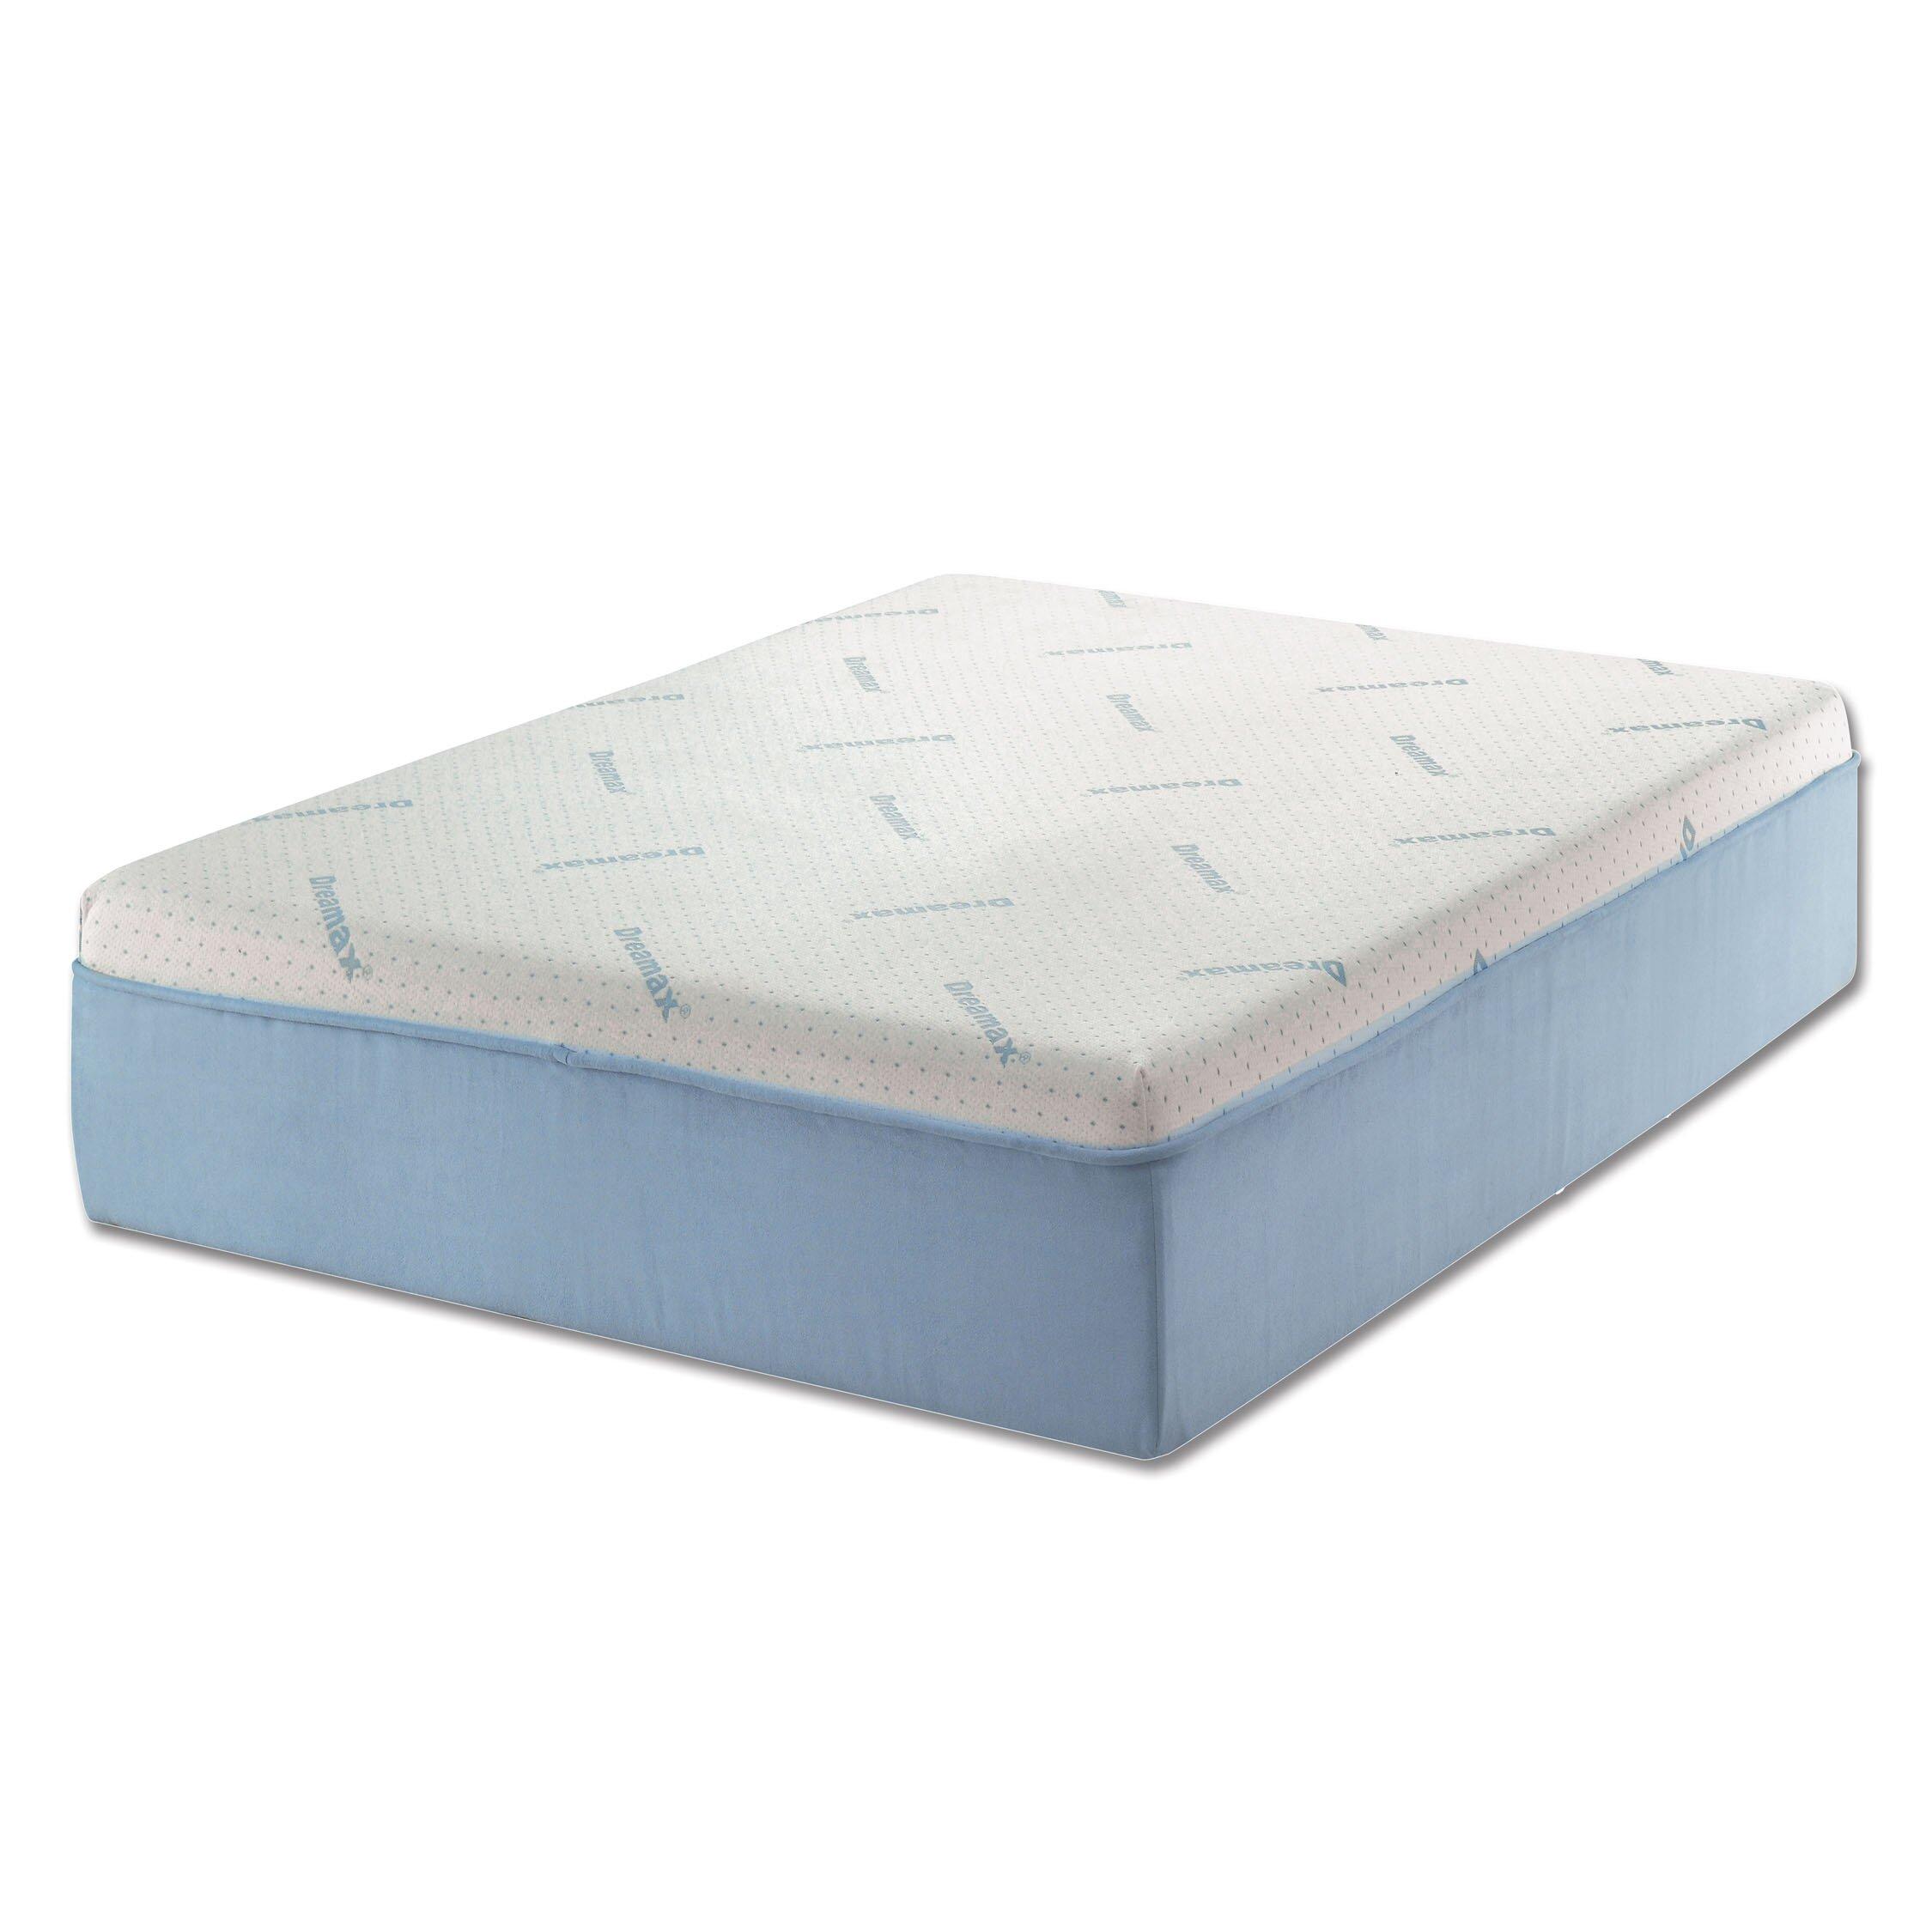 artesia 12 marble visco gel memory foam non flip mattress. Black Bedroom Furniture Sets. Home Design Ideas